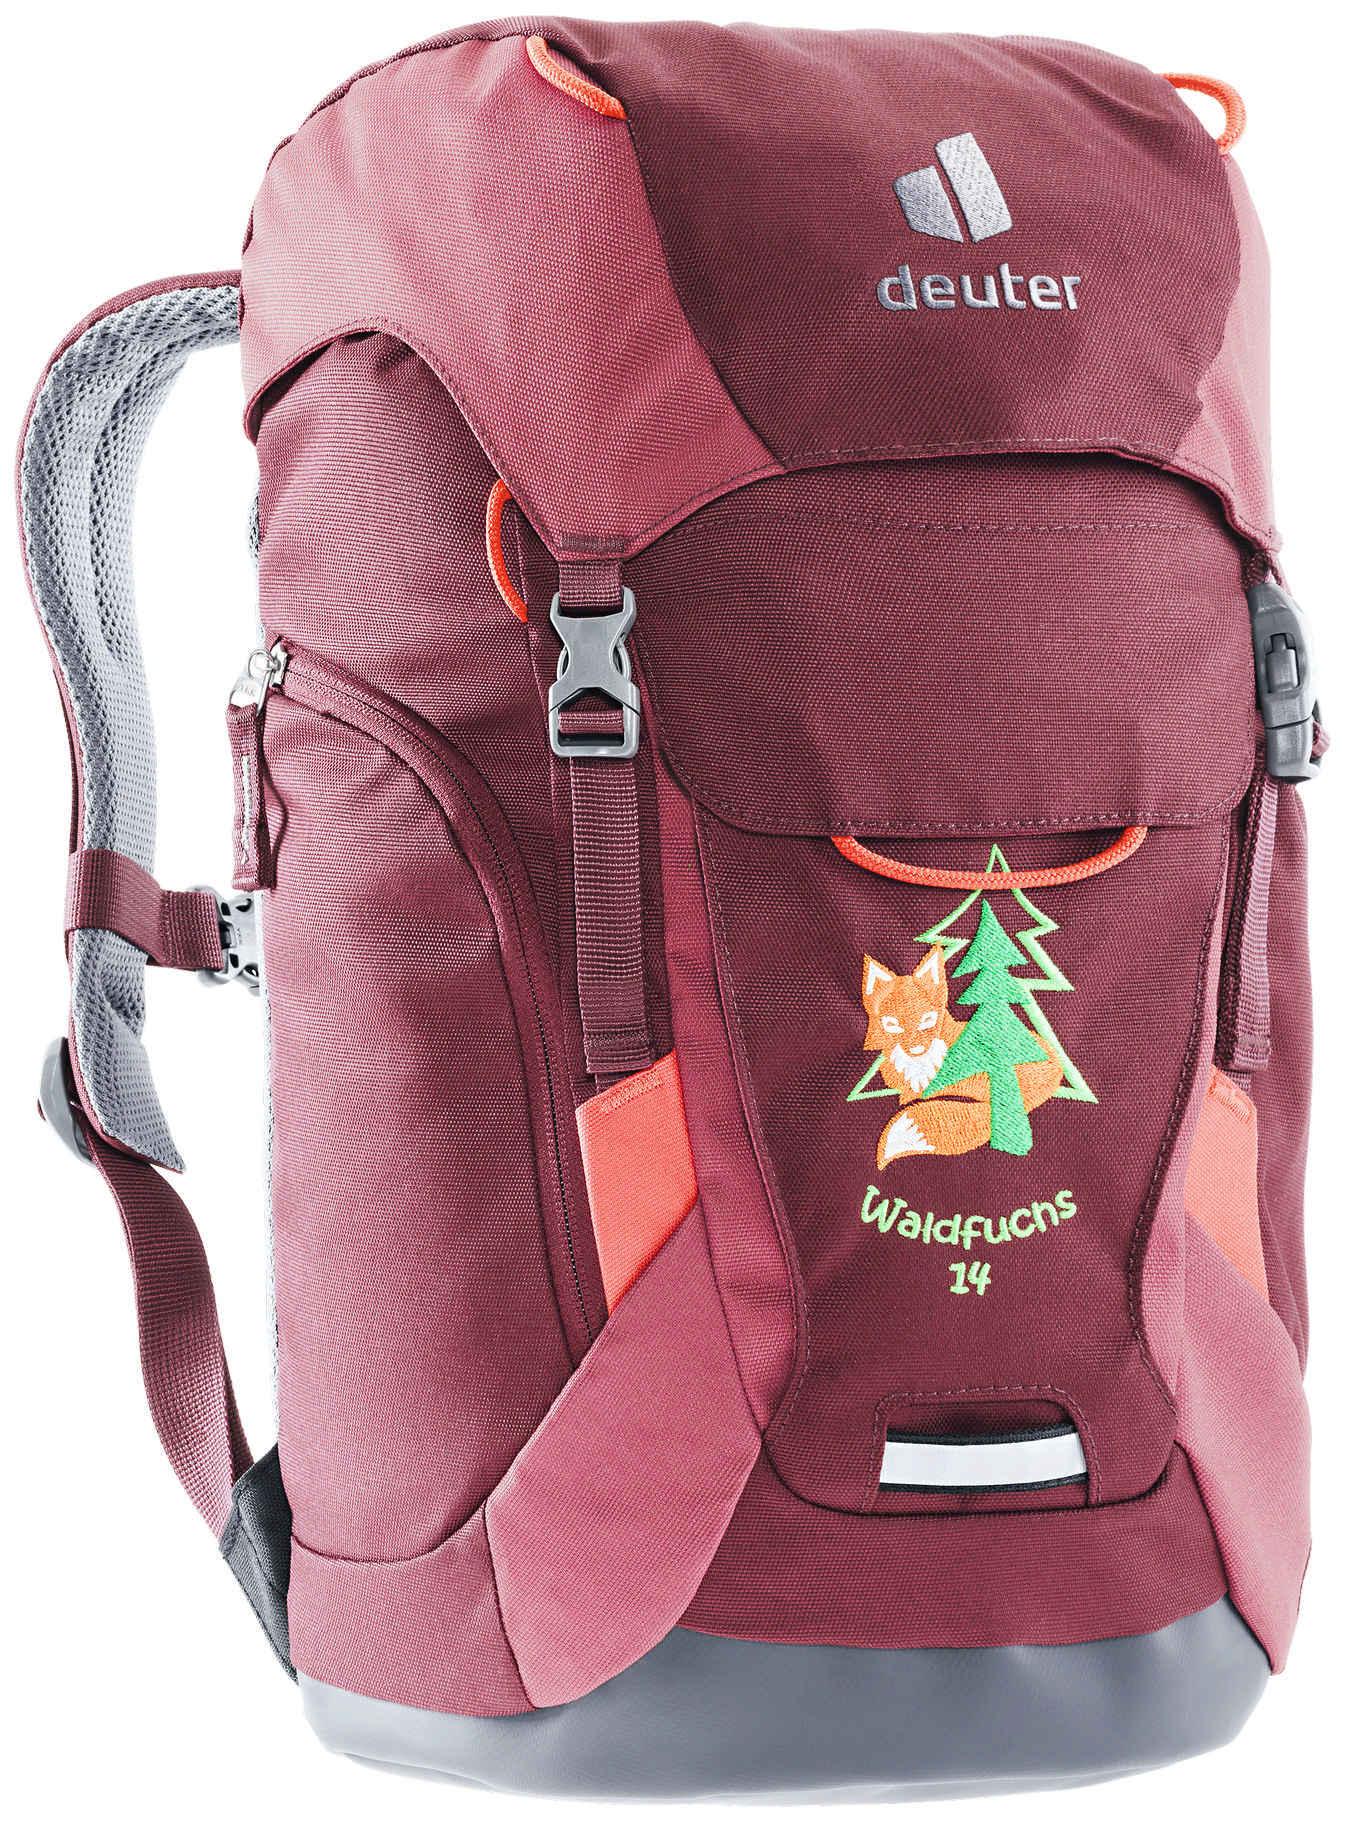 Детские рюкзаки Рюкзак детский Deuter Waldfuchs 14 (2021) 3610321-5529-Waldfuchs14-w19-d0.jpg